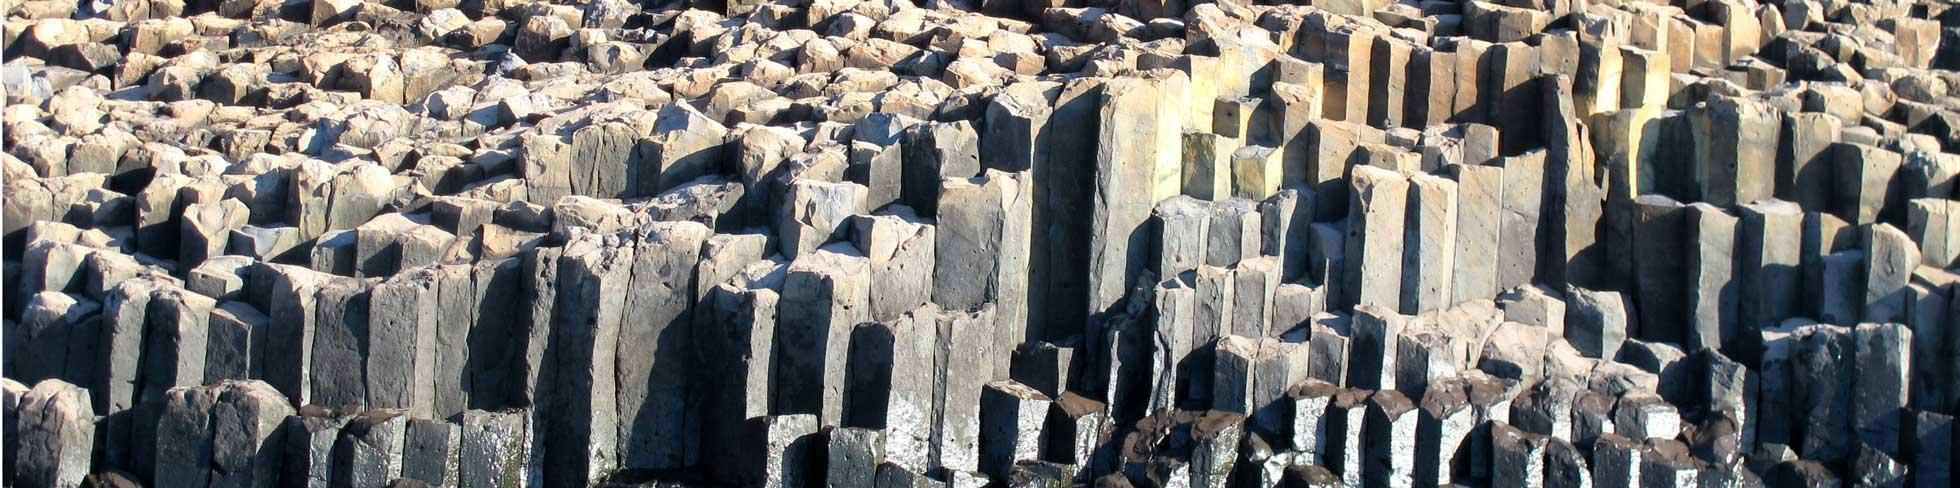 orgues basaltiques nosy mitsio